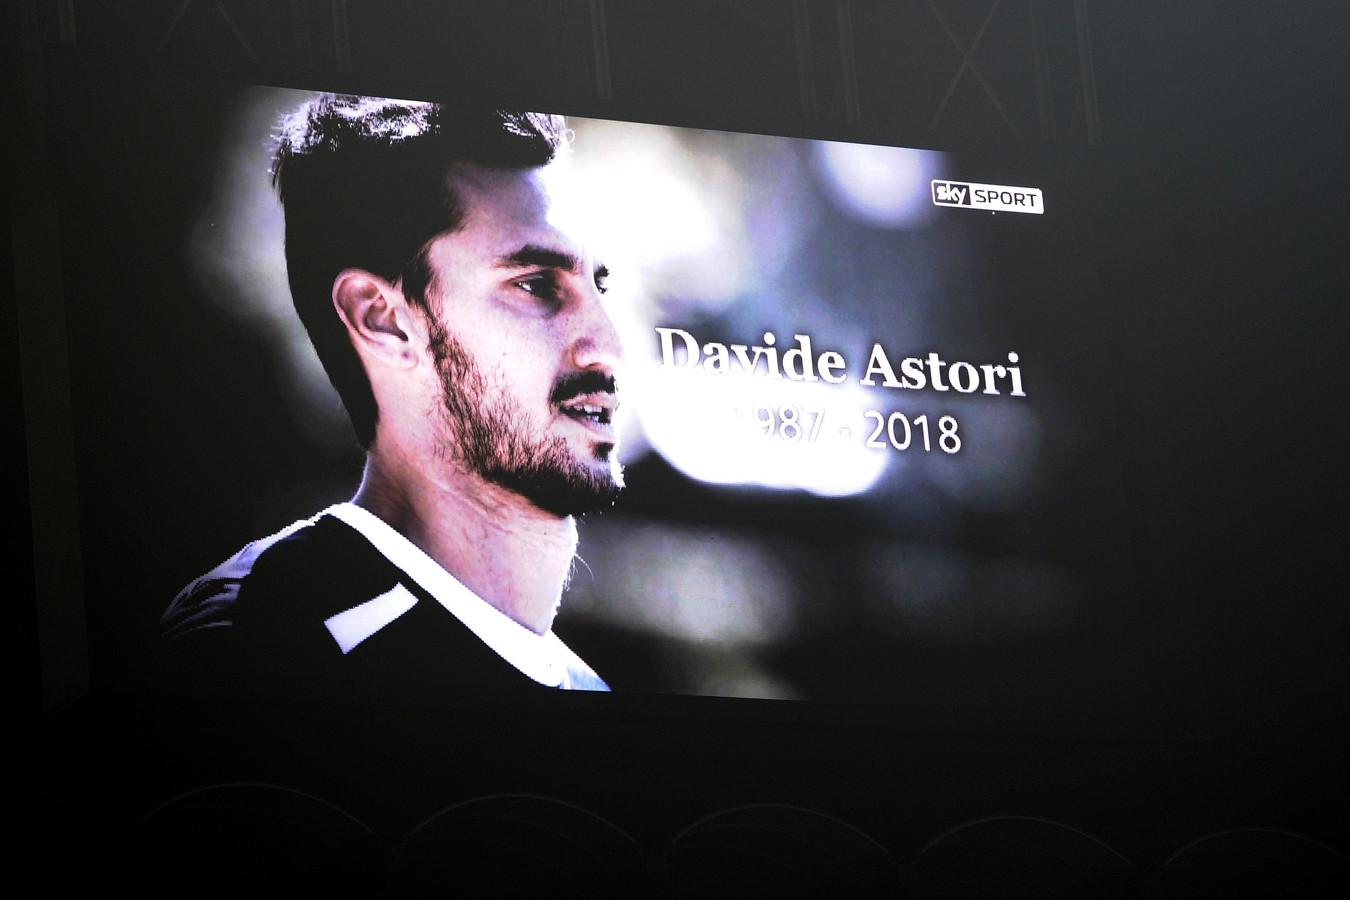 Davide Astori overleed in 2018.